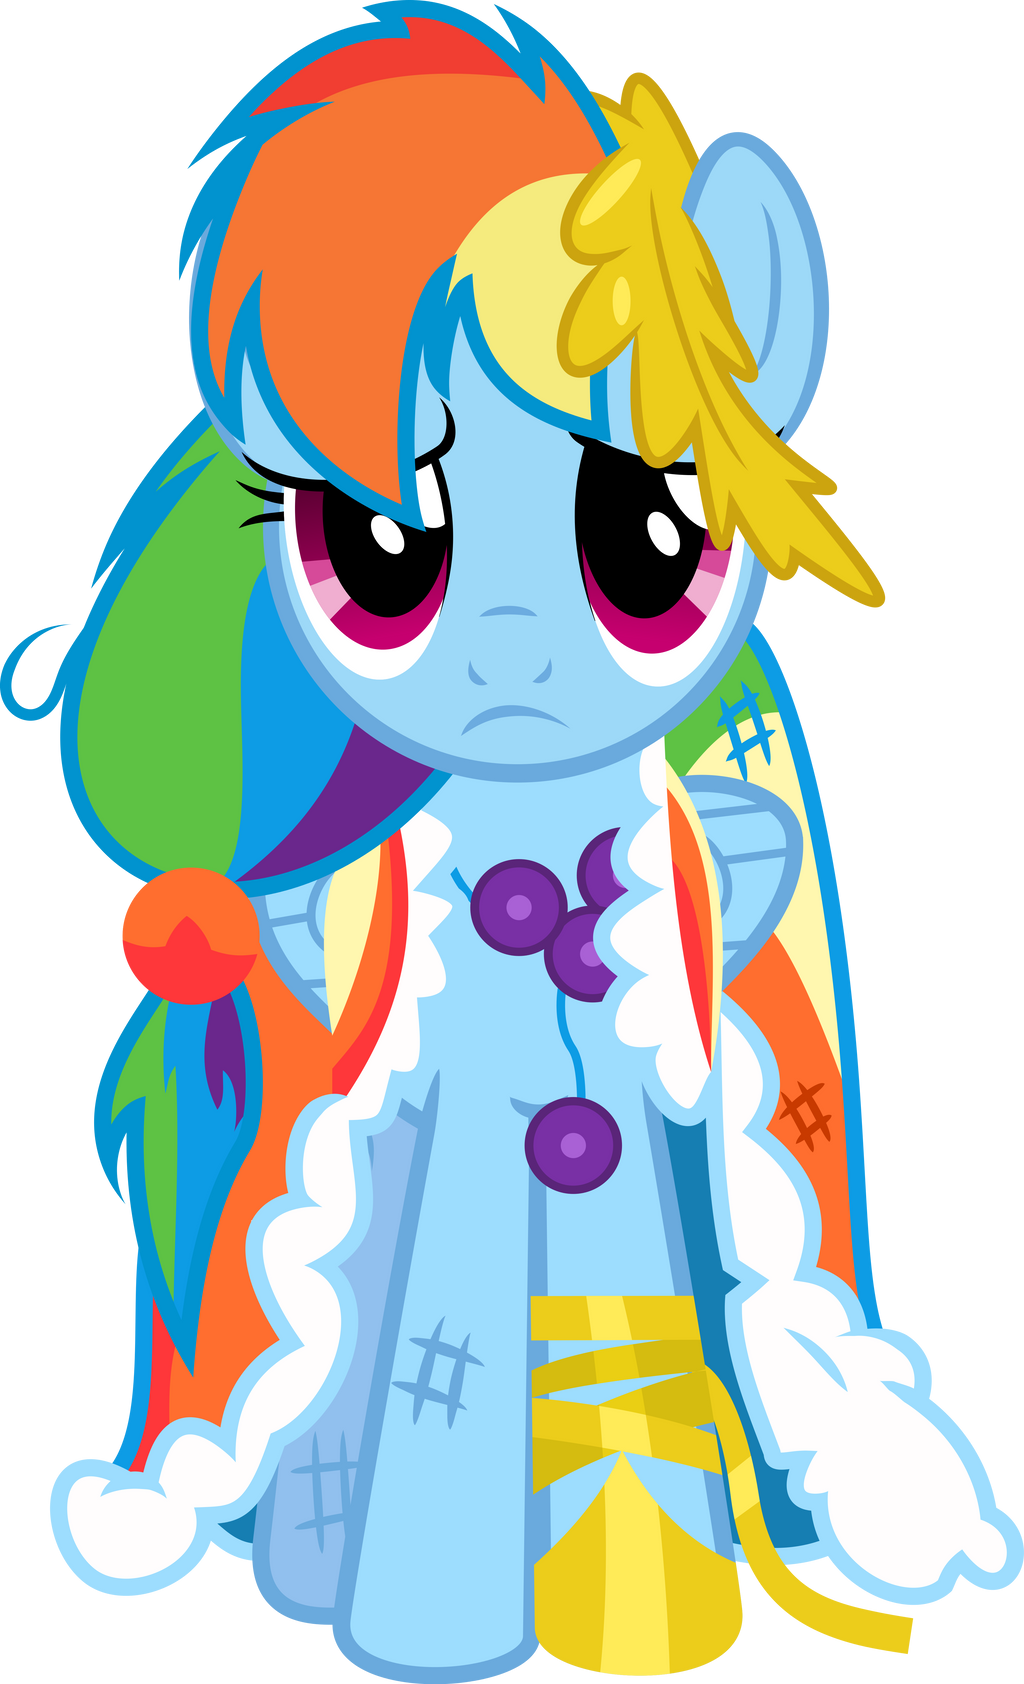 Rainbow Dash's Worst Night Ever by RainbowRage12